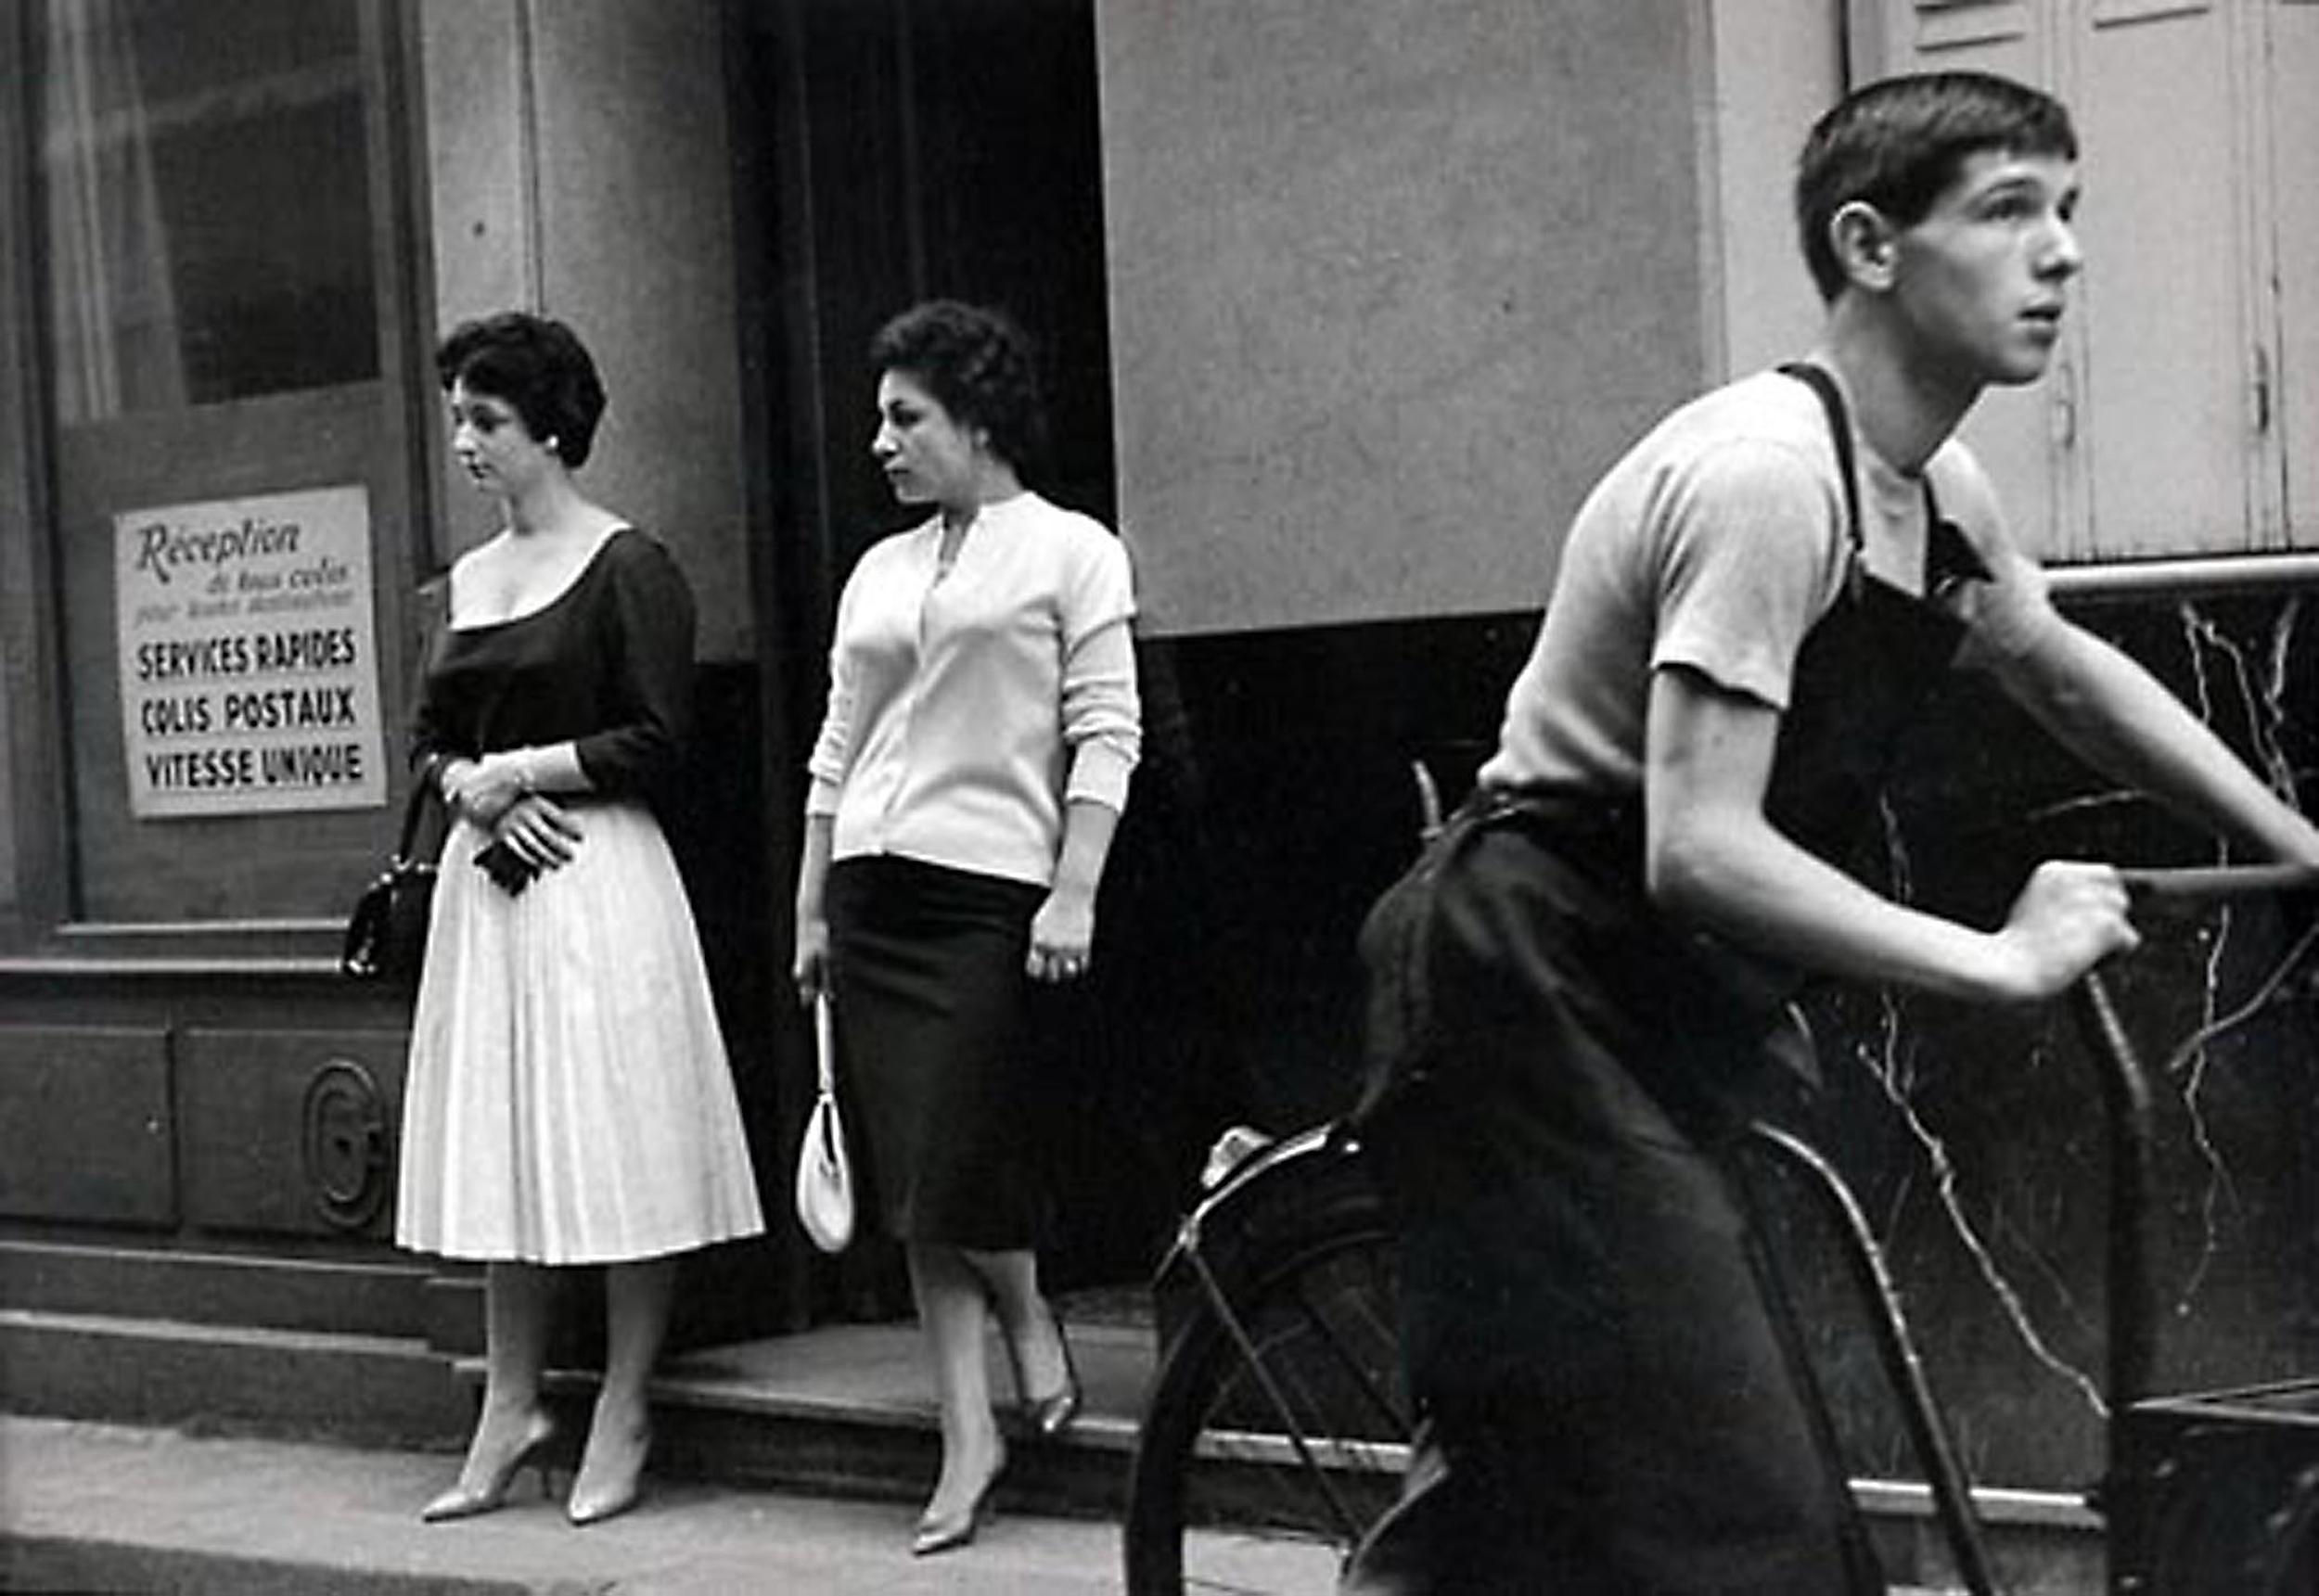 HANNON_quick_service_women_(paris)_1956_11x14_high.jpg